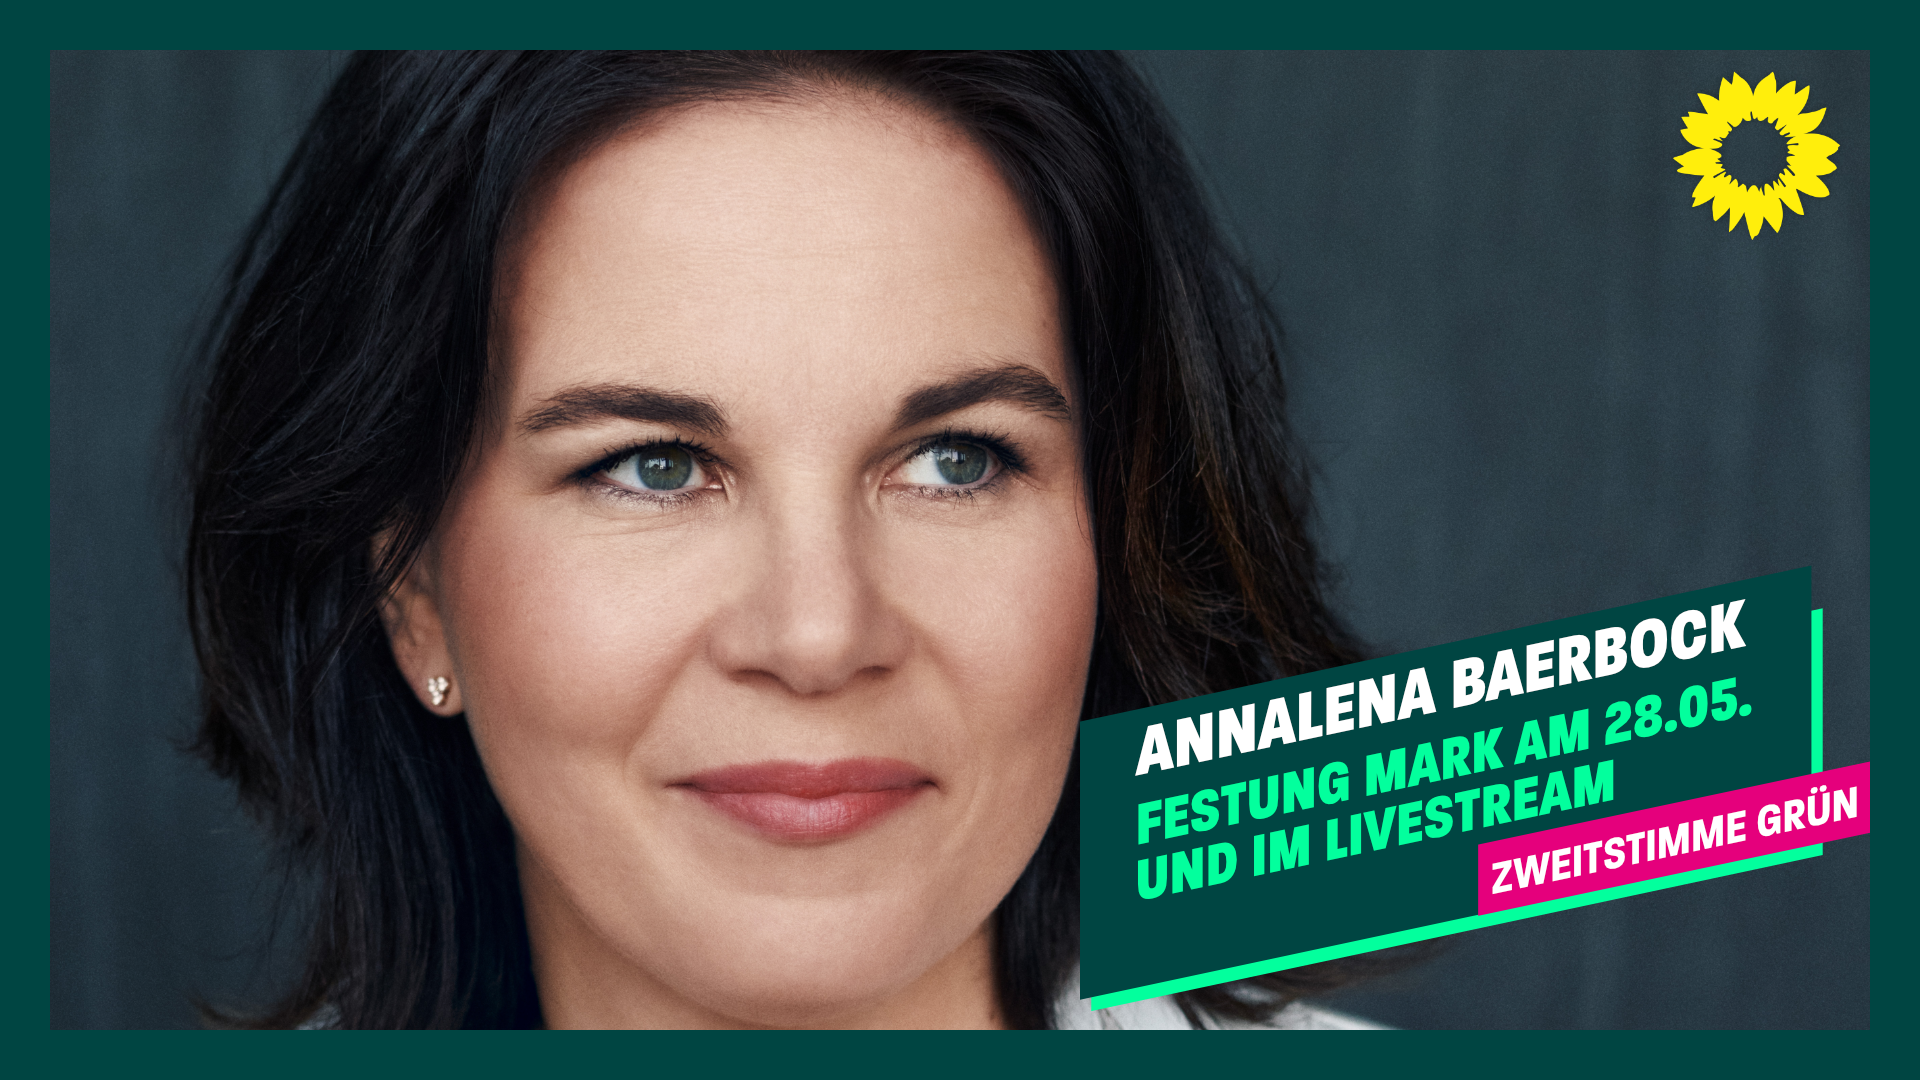 Annalena Baerbock – Wahlkampfkundgebung in Magdeburg – 28. Mai, 17 Uhr, Festung Mark